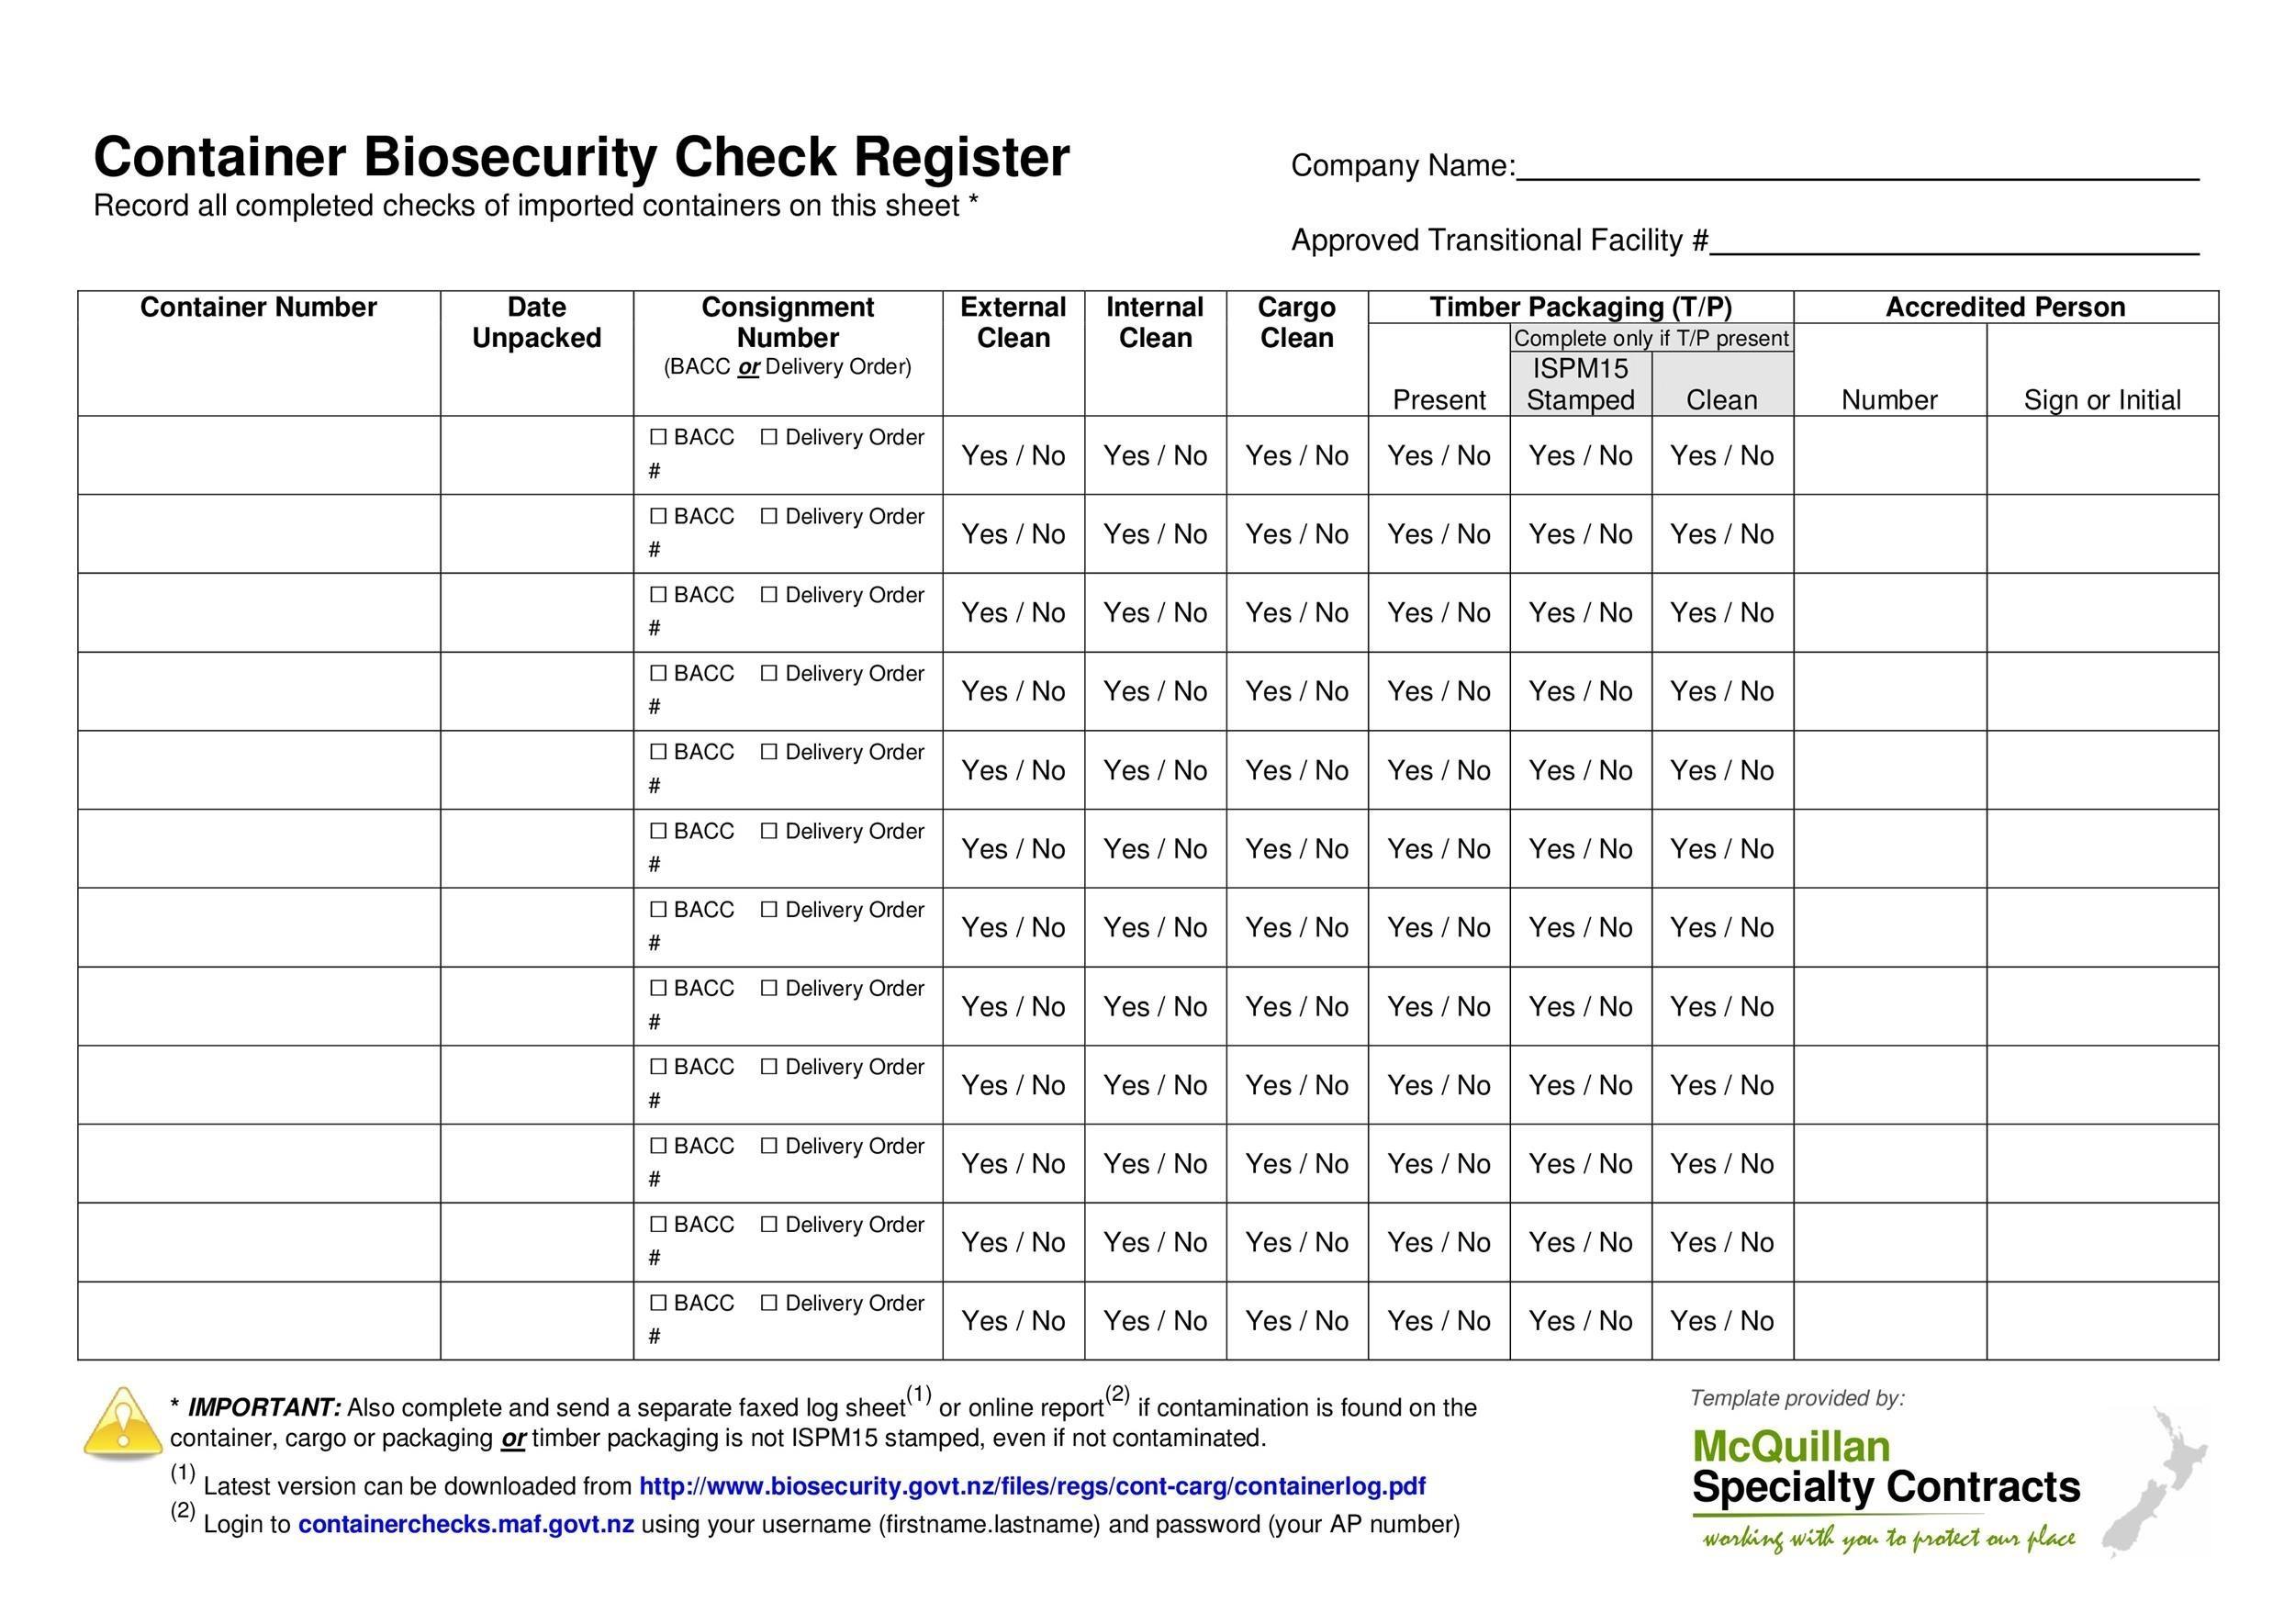 37 Checkbook Register Templates 100 Free, Printable - Template Lab